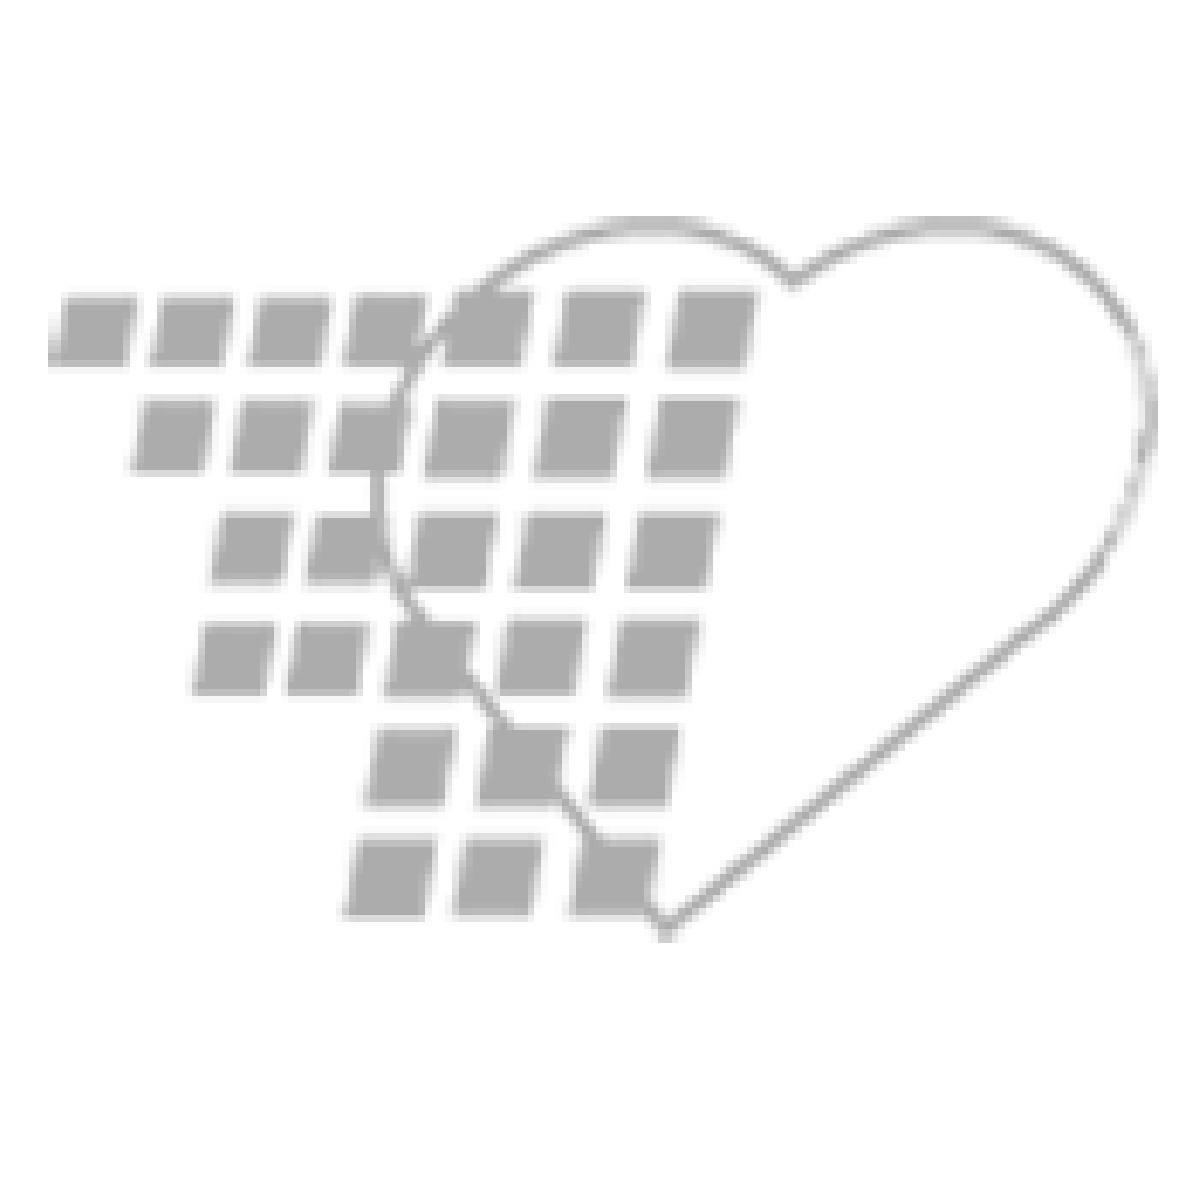 02-38-7109 Bayer Contour® Control Solution